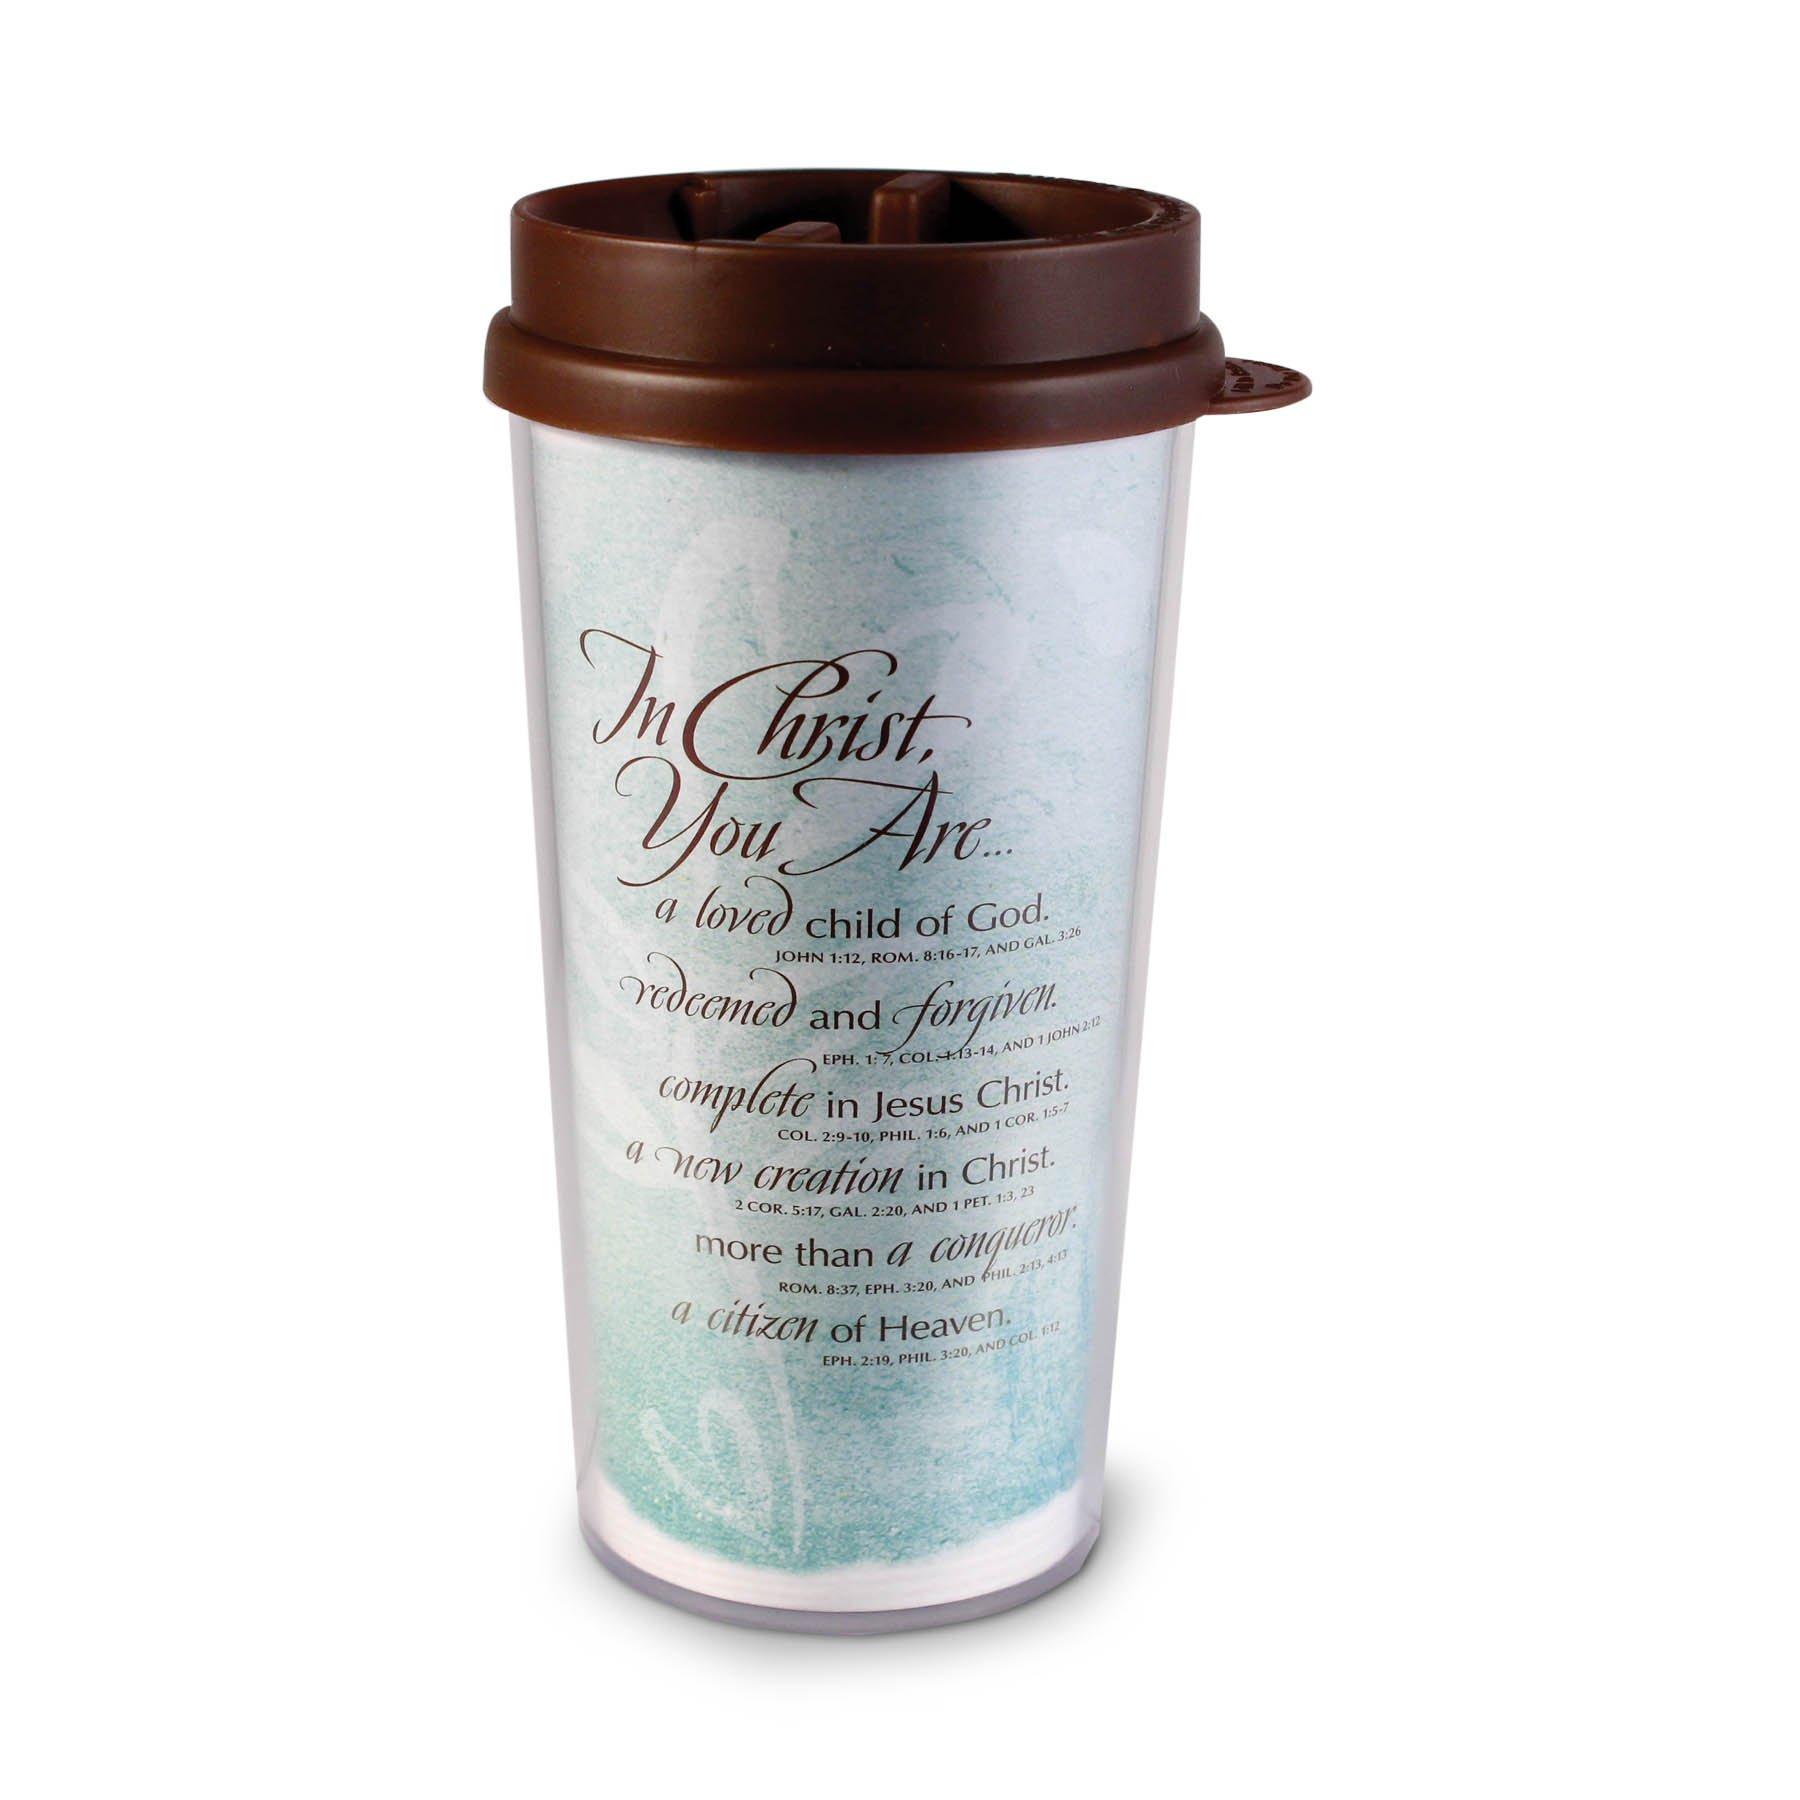 Lighthouse Christian Products Tin Christ Woman Growing Heart Wavy Acrylic/Plastic Tumbler Mug, 16 oz by Lighthouse Christian Products